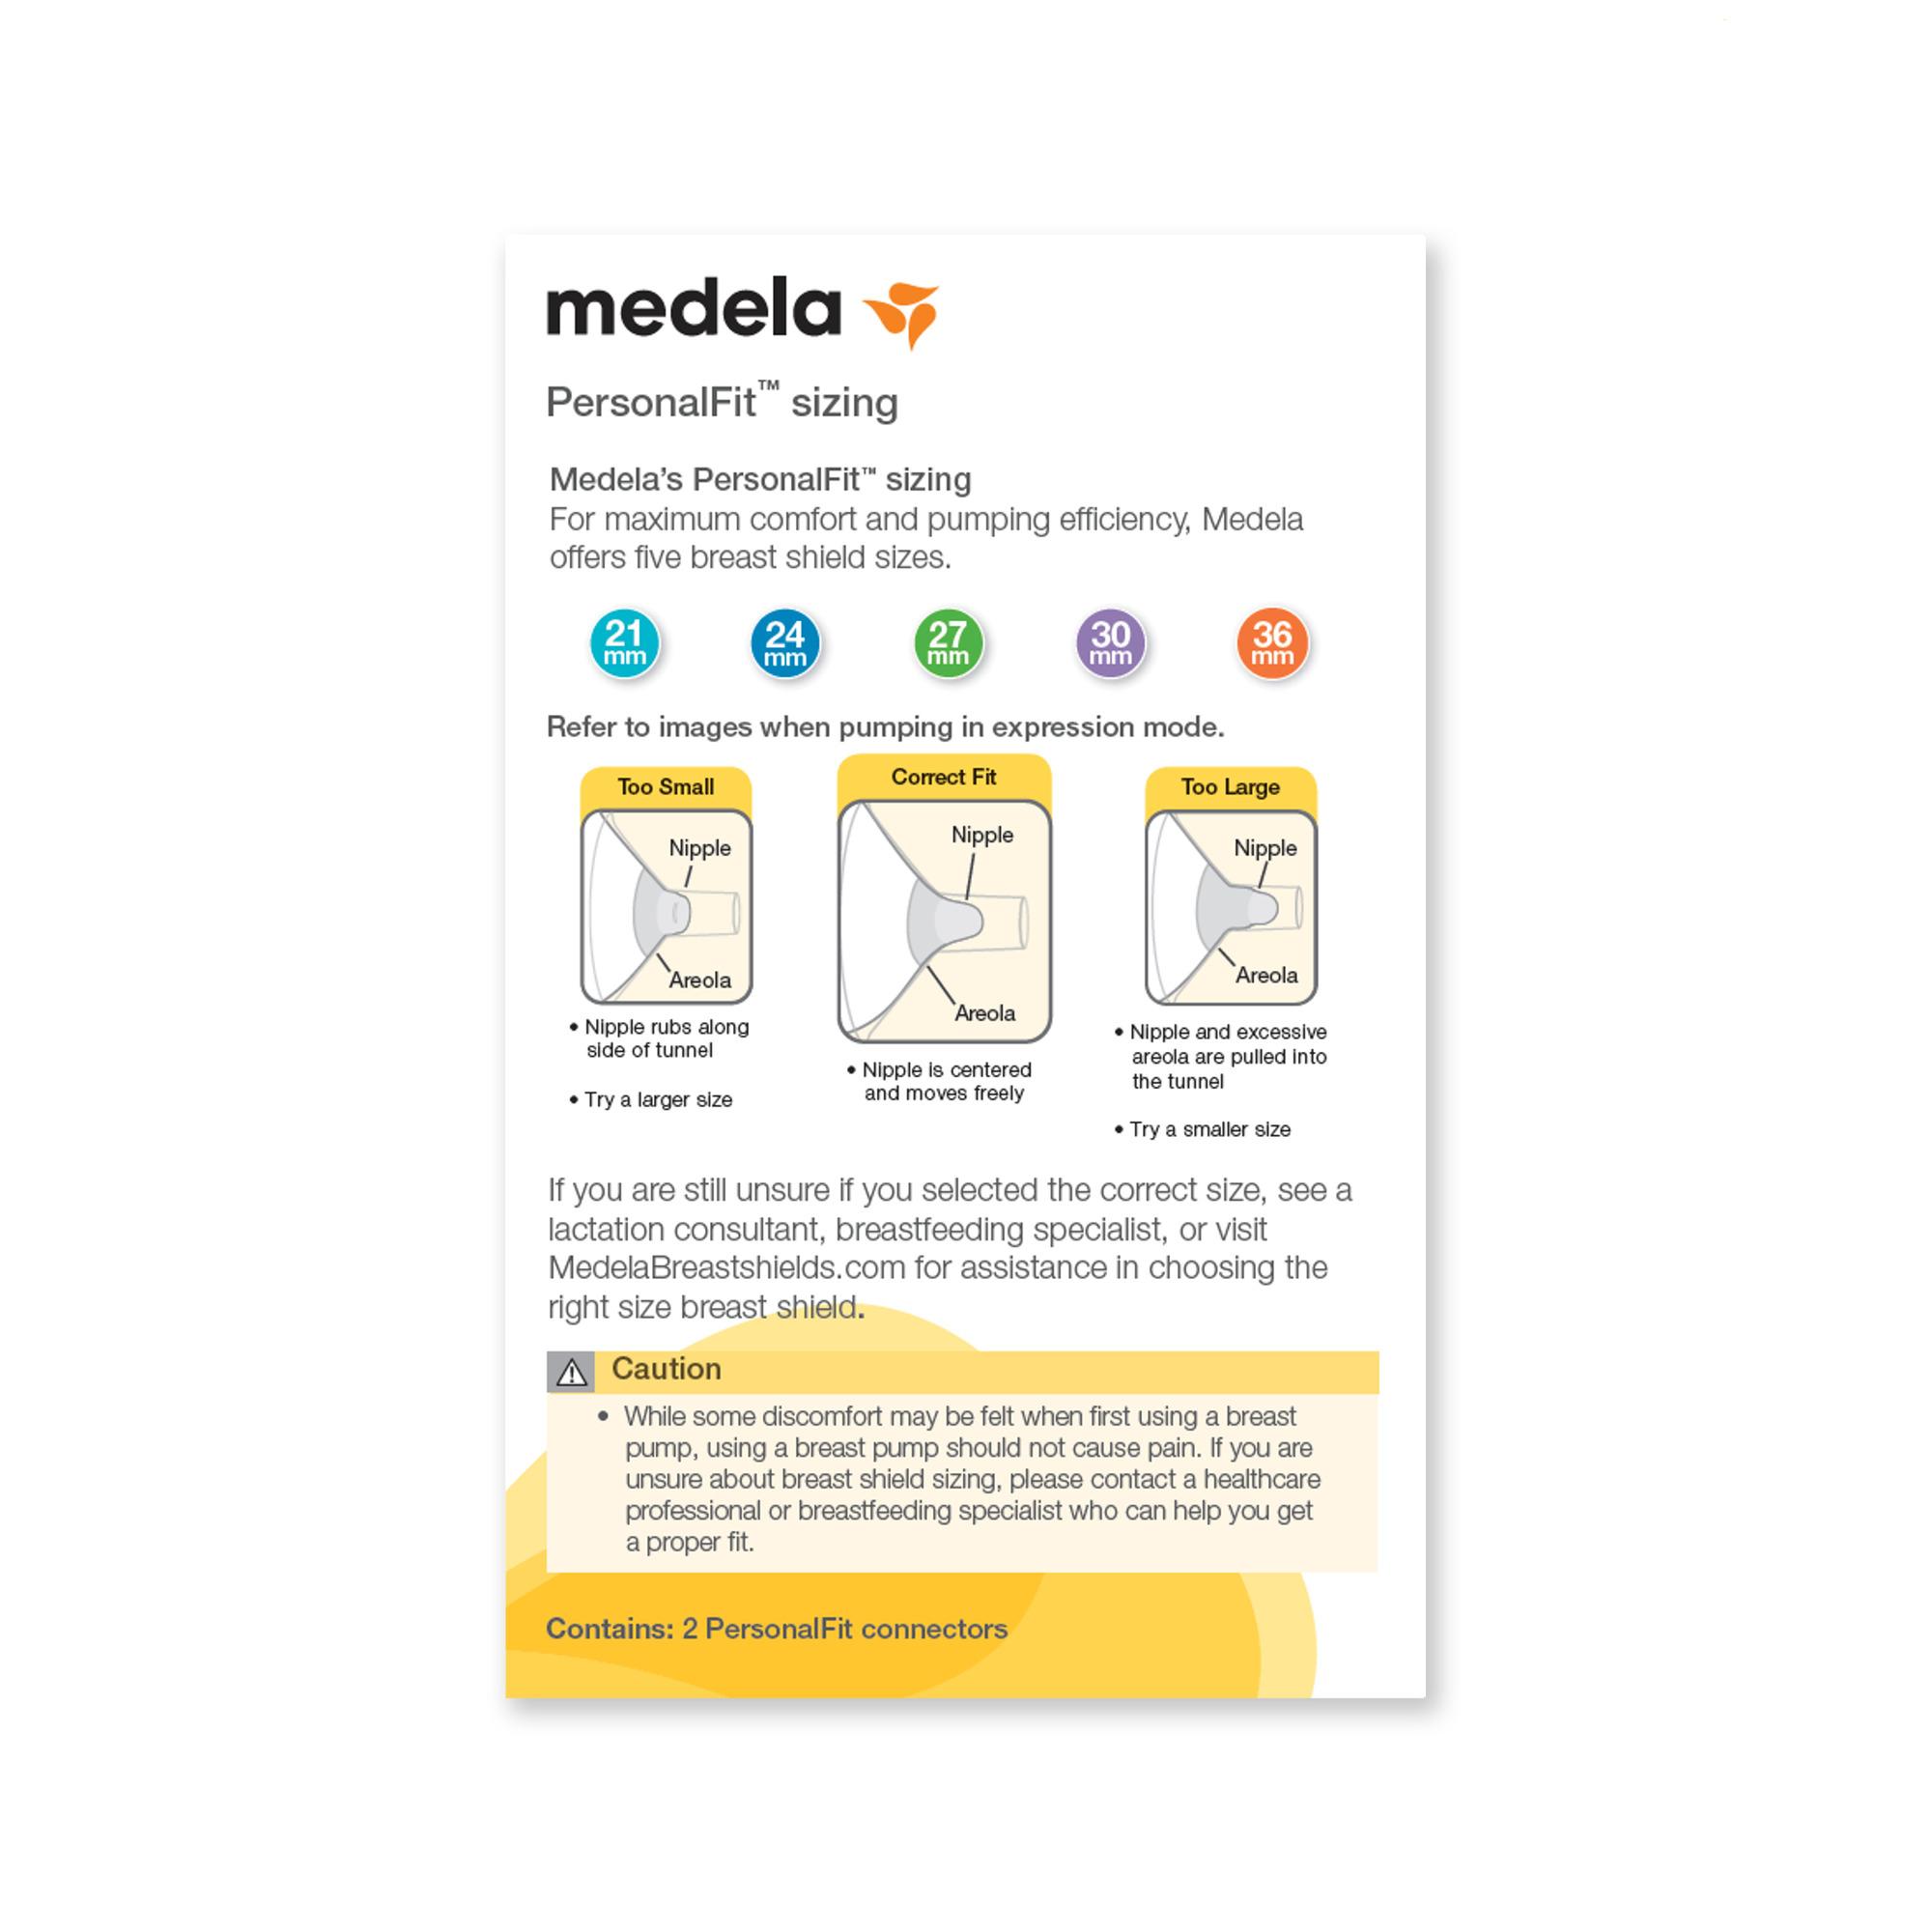 Medela PersonalFit Breast Shields 21mm (Small), 2 ea